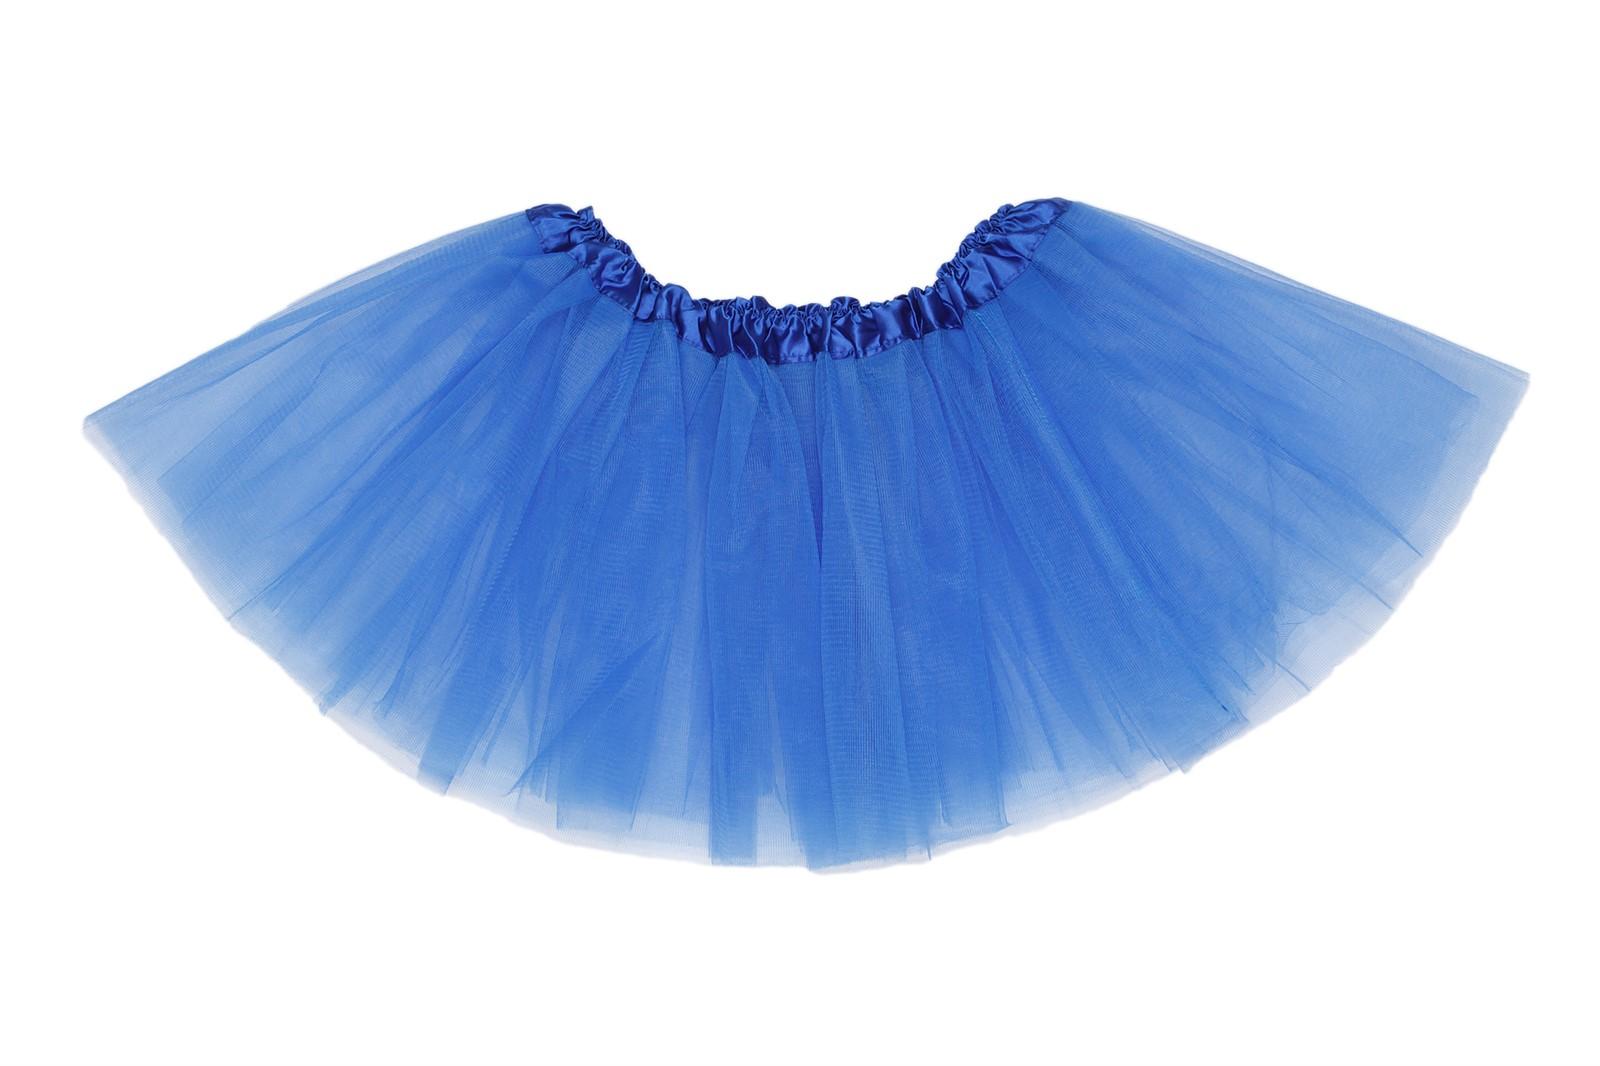 LADIES PETTICOAT TUTU SKIRT 80S DANCE COSTUME FANCY DRESS HEN PARTY BALLET | eBay